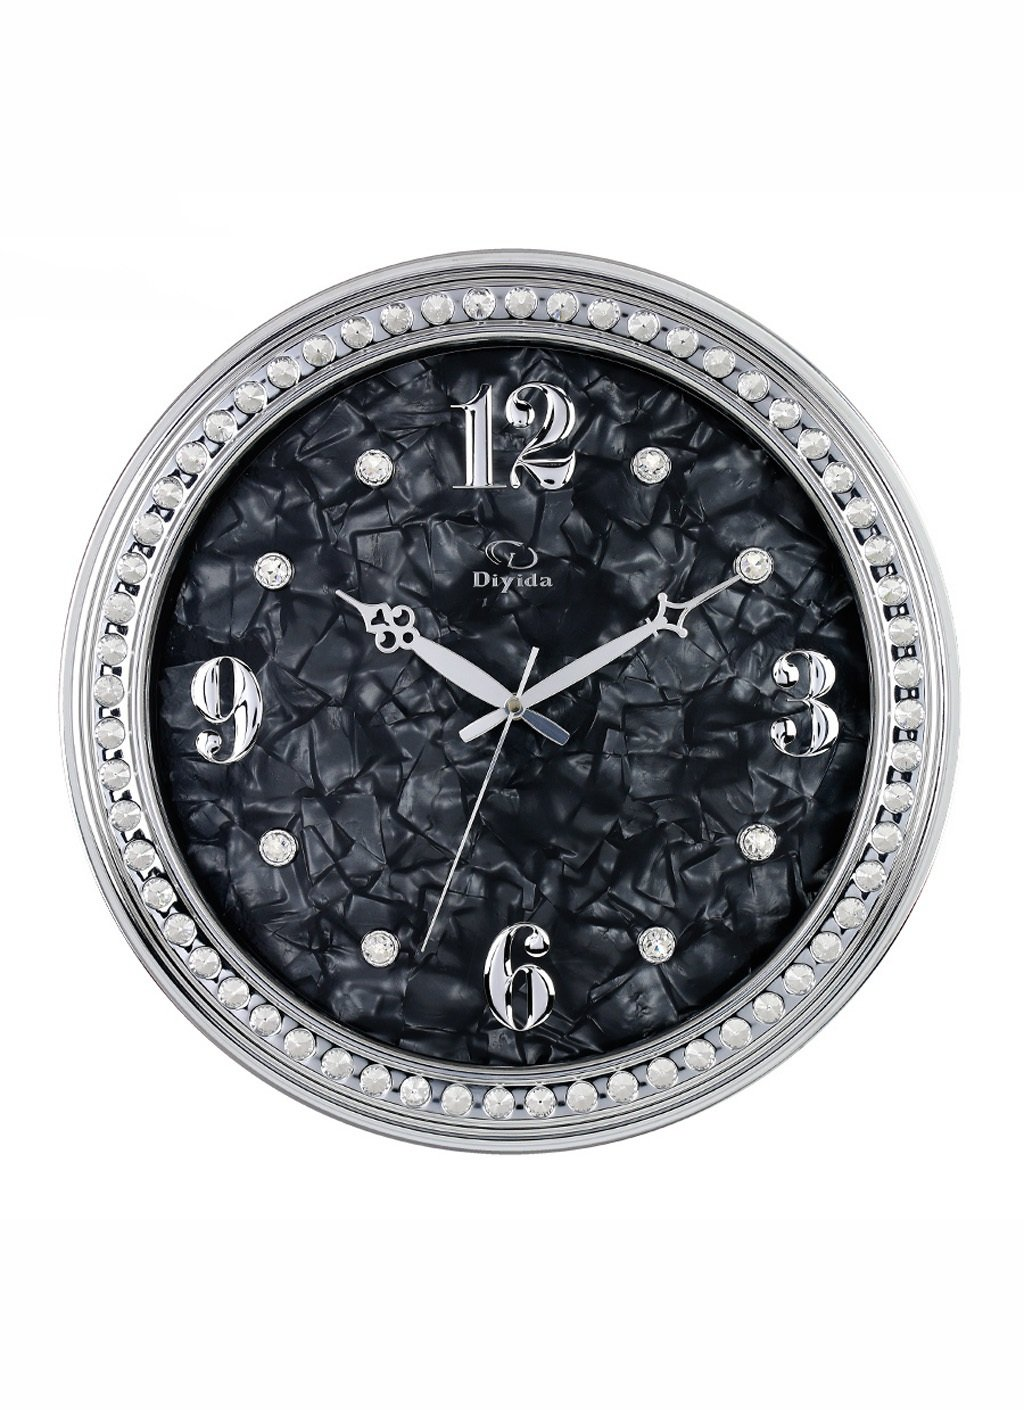 ZHENAI リビングルームクリエイティブ20インチの壁時計、ベッドルーム静かな金属製クォーツ壁掛け時計、3種 ( 色 : C , サイズ さいず : 20 Inches ) B07BKYRJF6 20 Inches C C 20 Inches